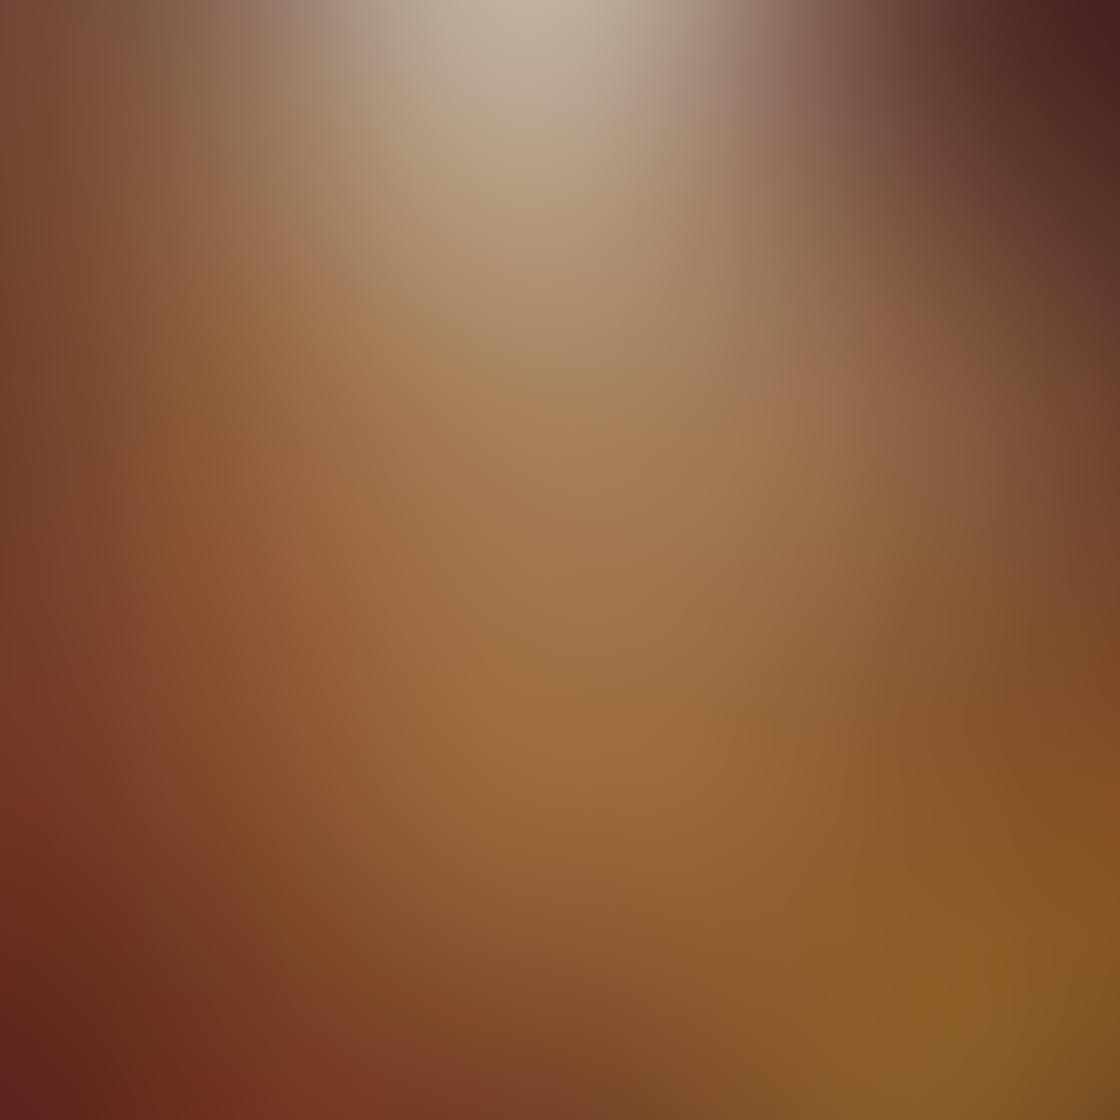 iPhone Photography Light 6